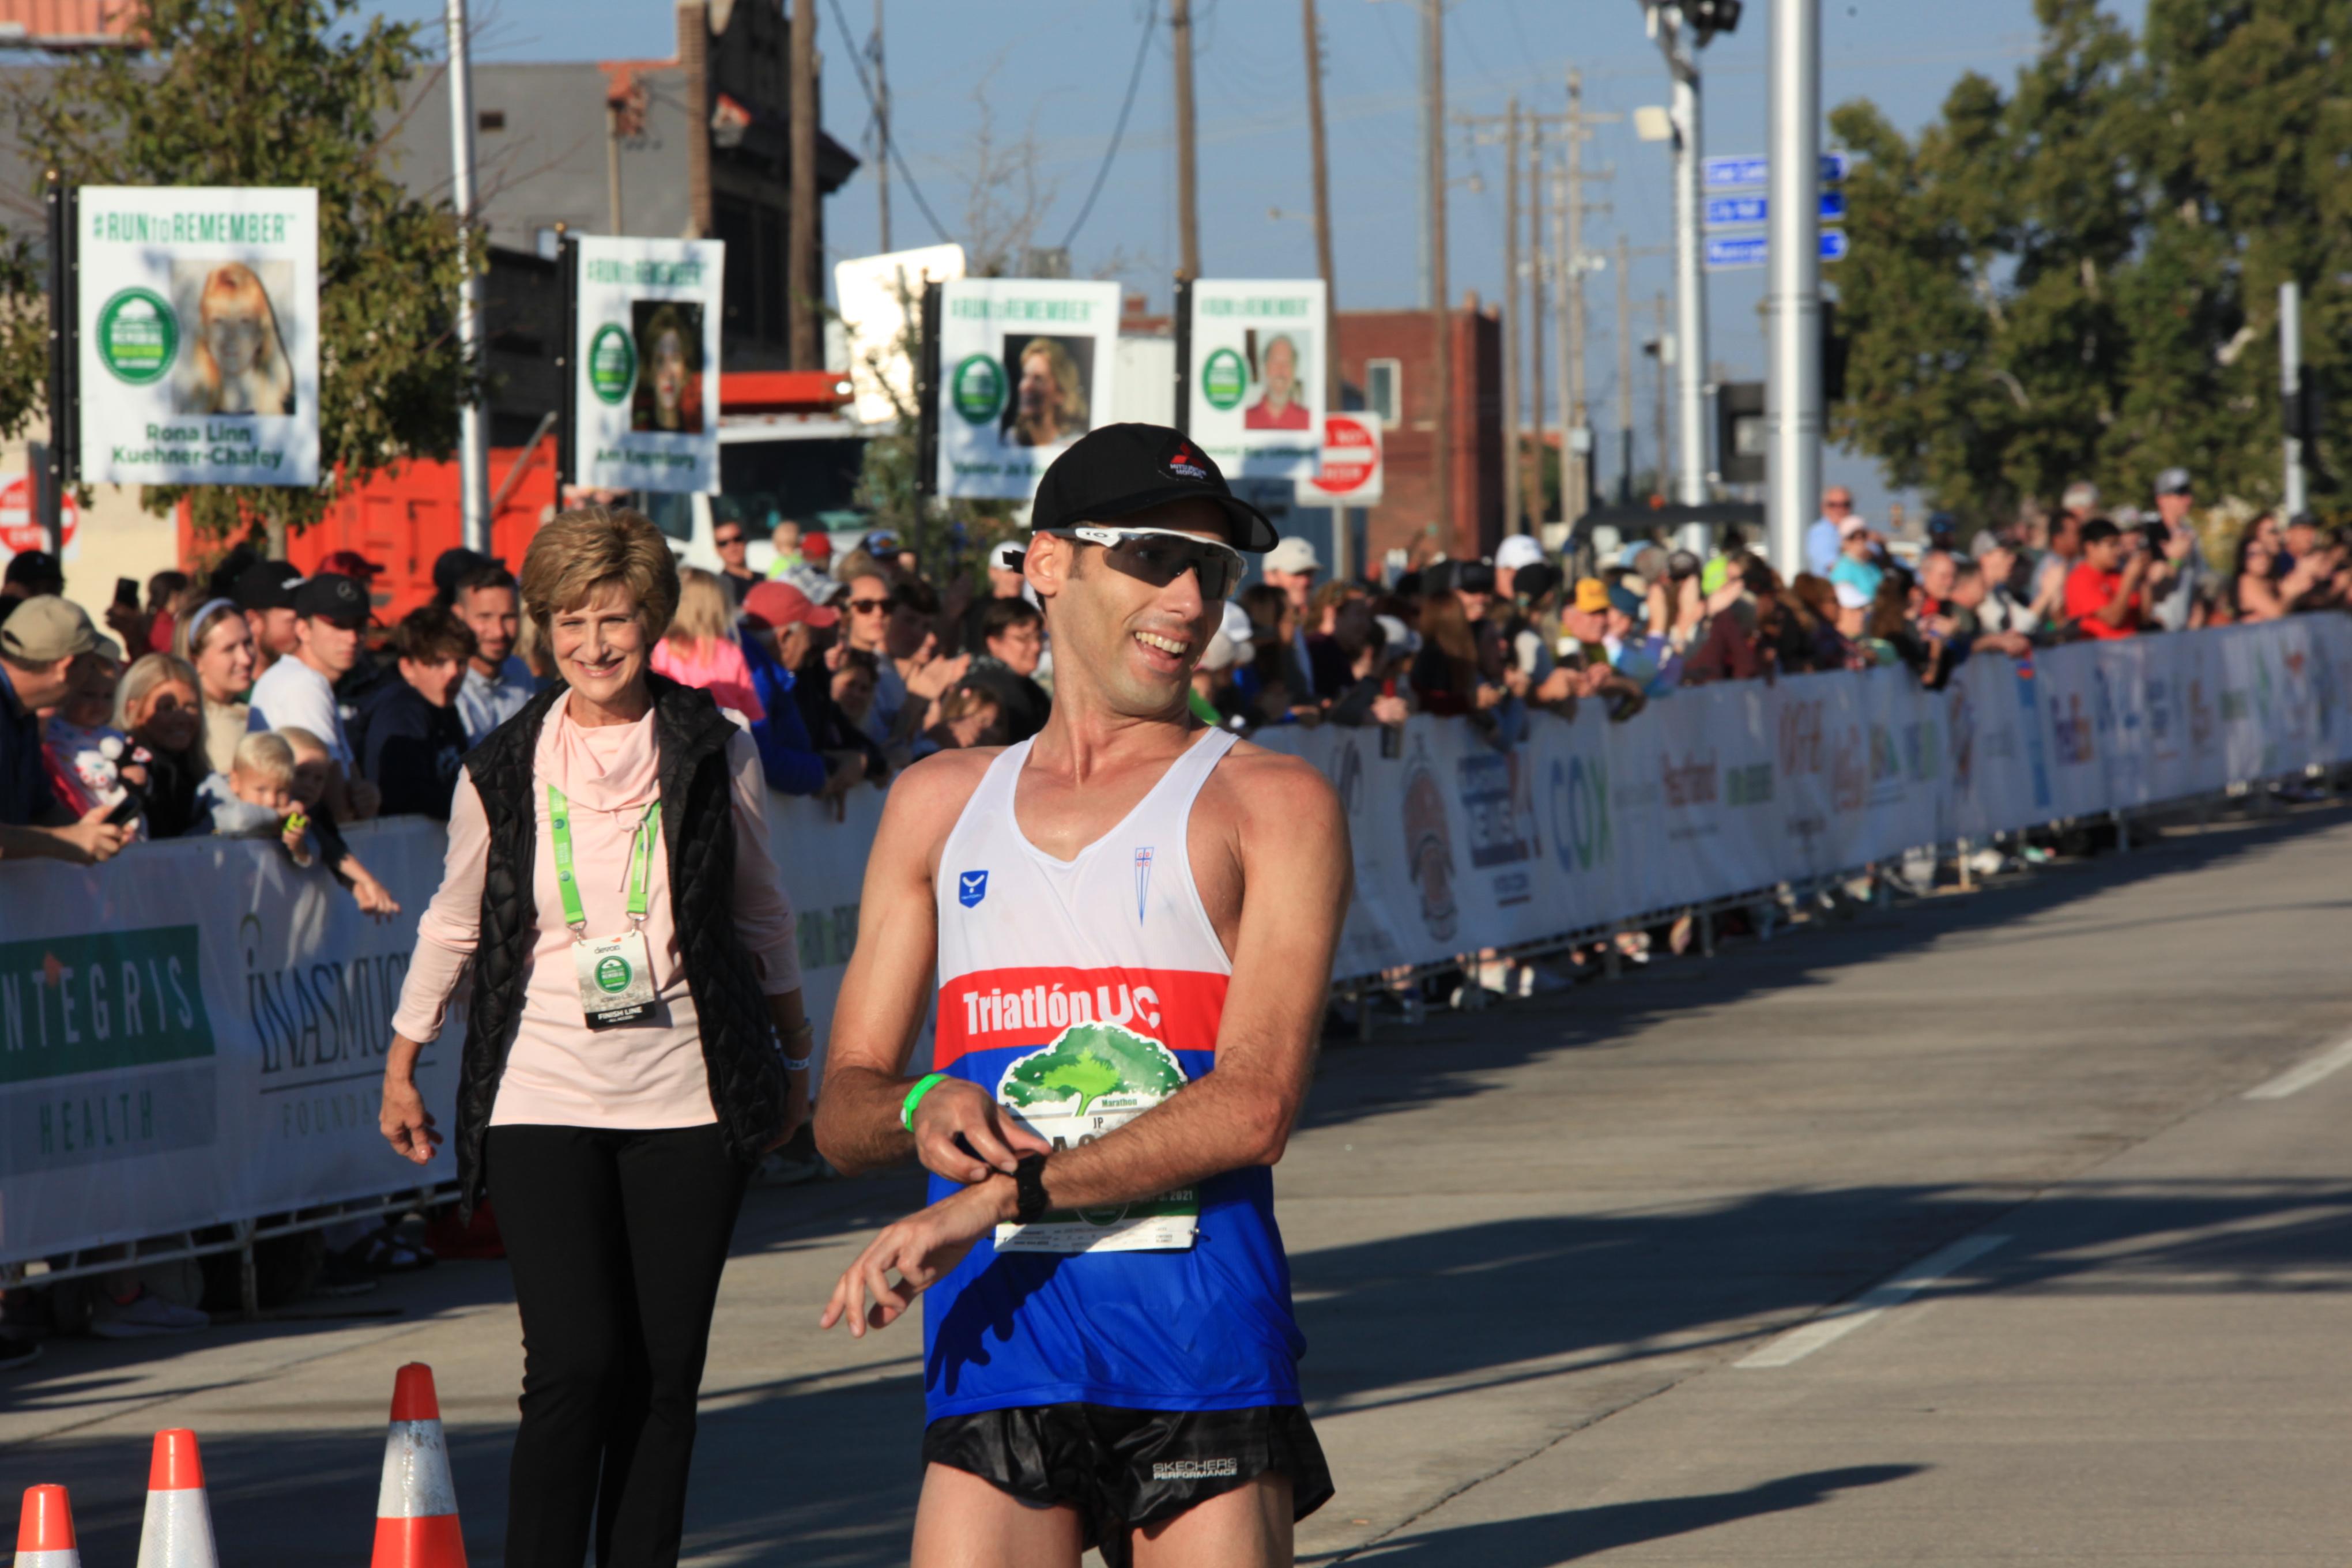 Jose Pablo Salazar Ezquerra wins the Men's Oklahoma City Memorial Marathon 2021